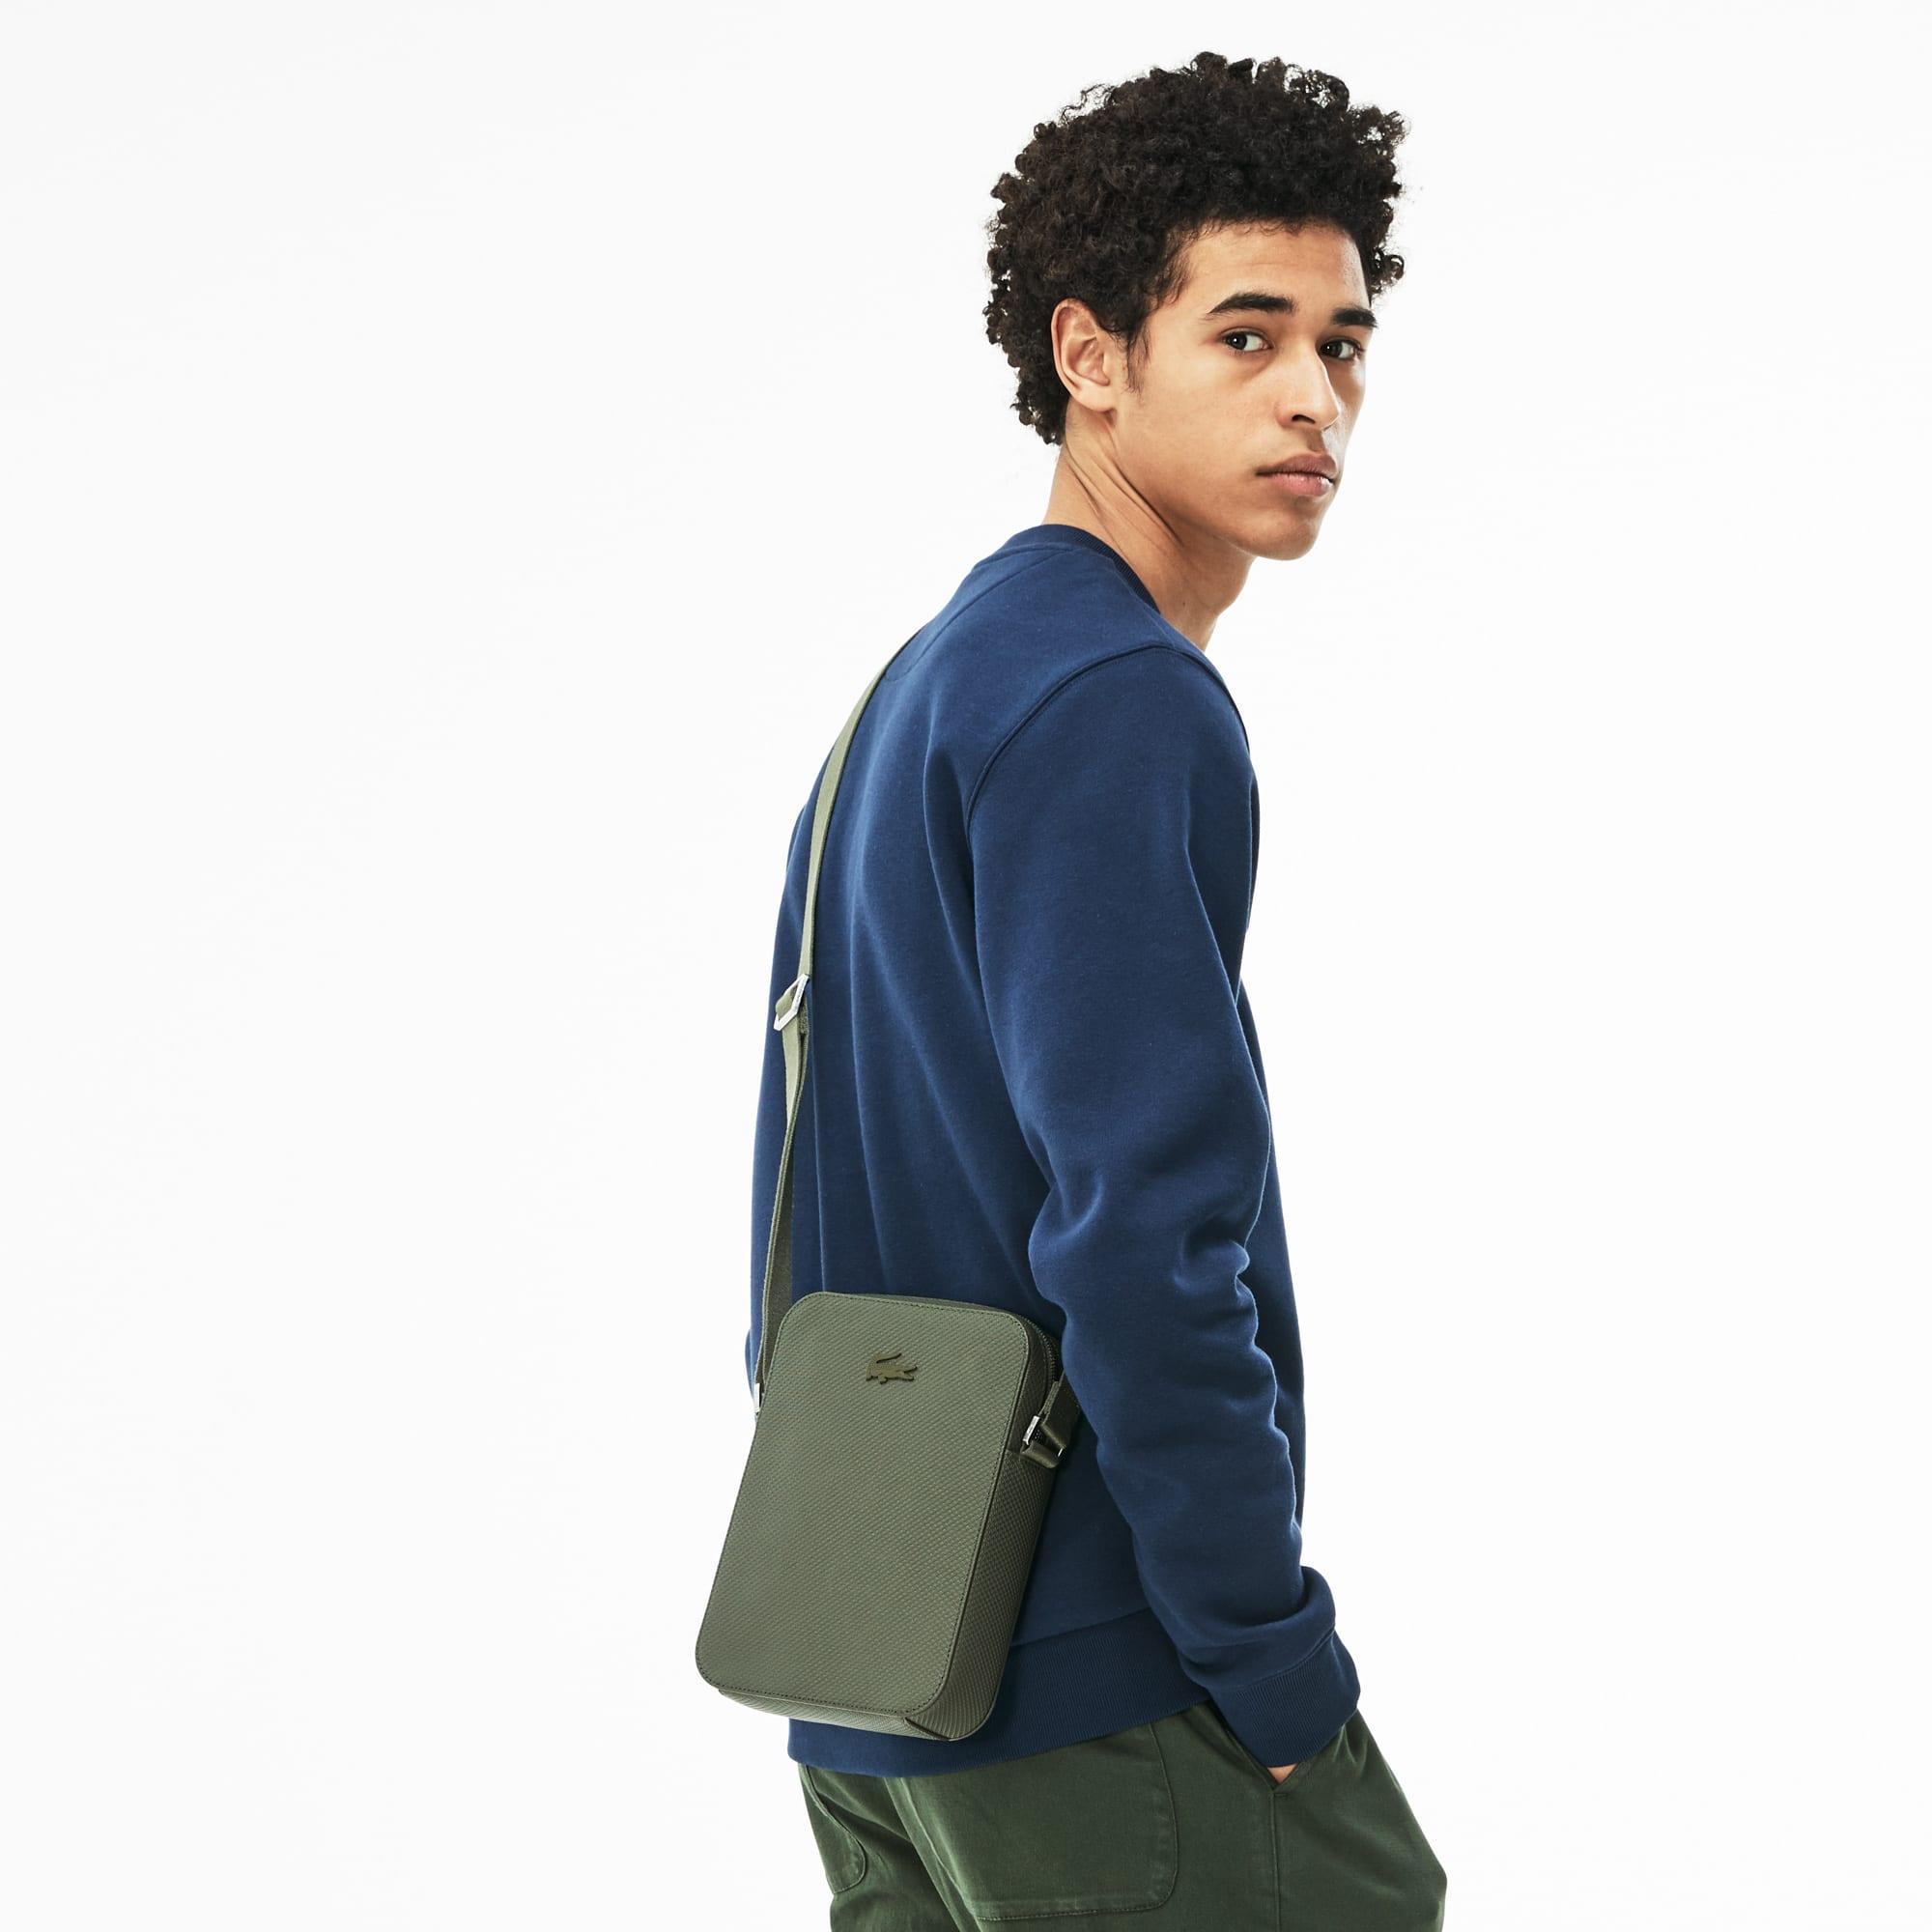 Vertikale Herren-Tasche CHANTACO aus mattem Piqué-Leder